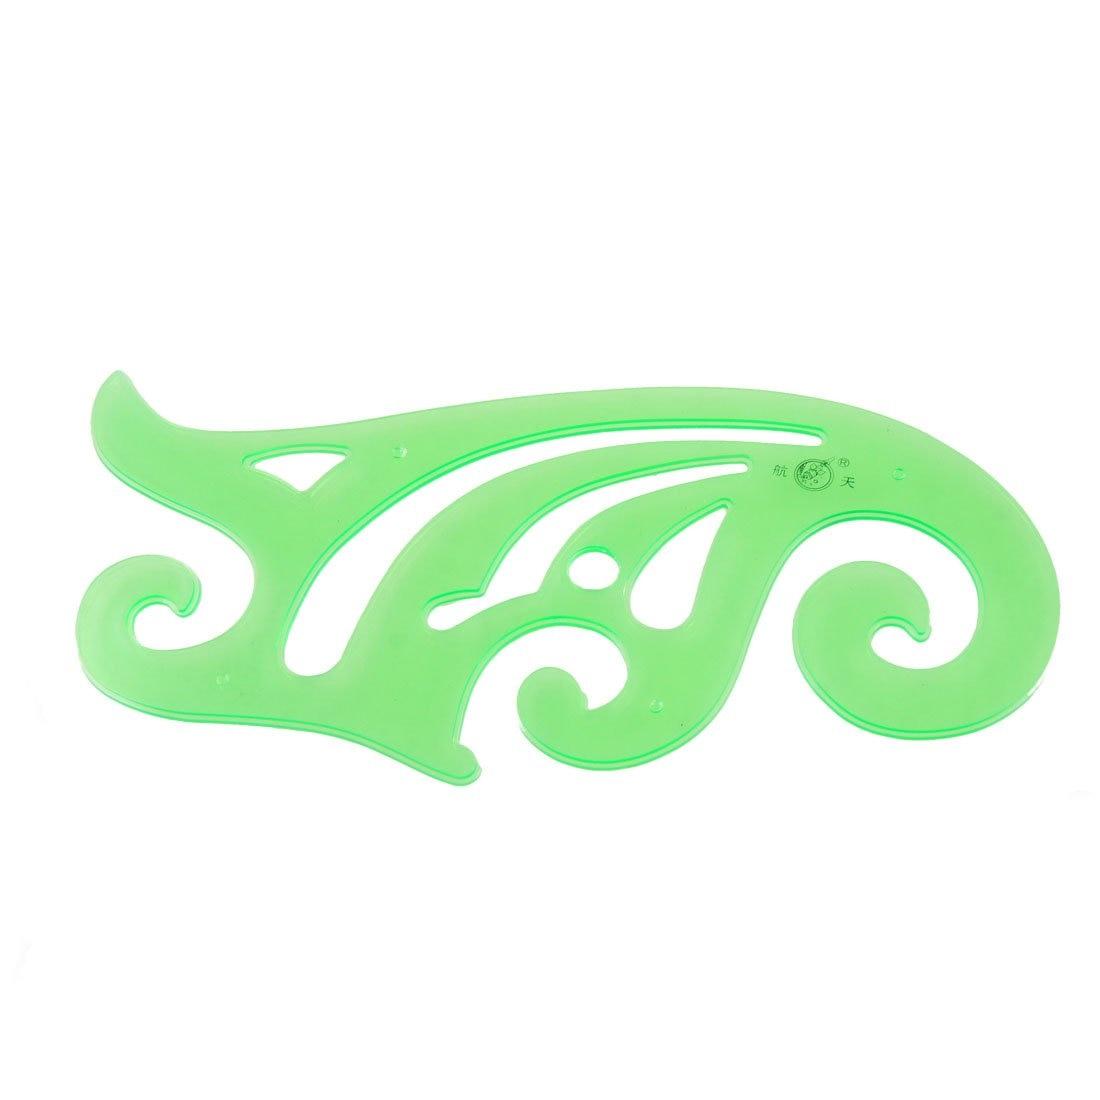 все цены на 10pack (25cm Long Clear Green Drafting Drawing Tool Plastic French Curve Ruler онлайн